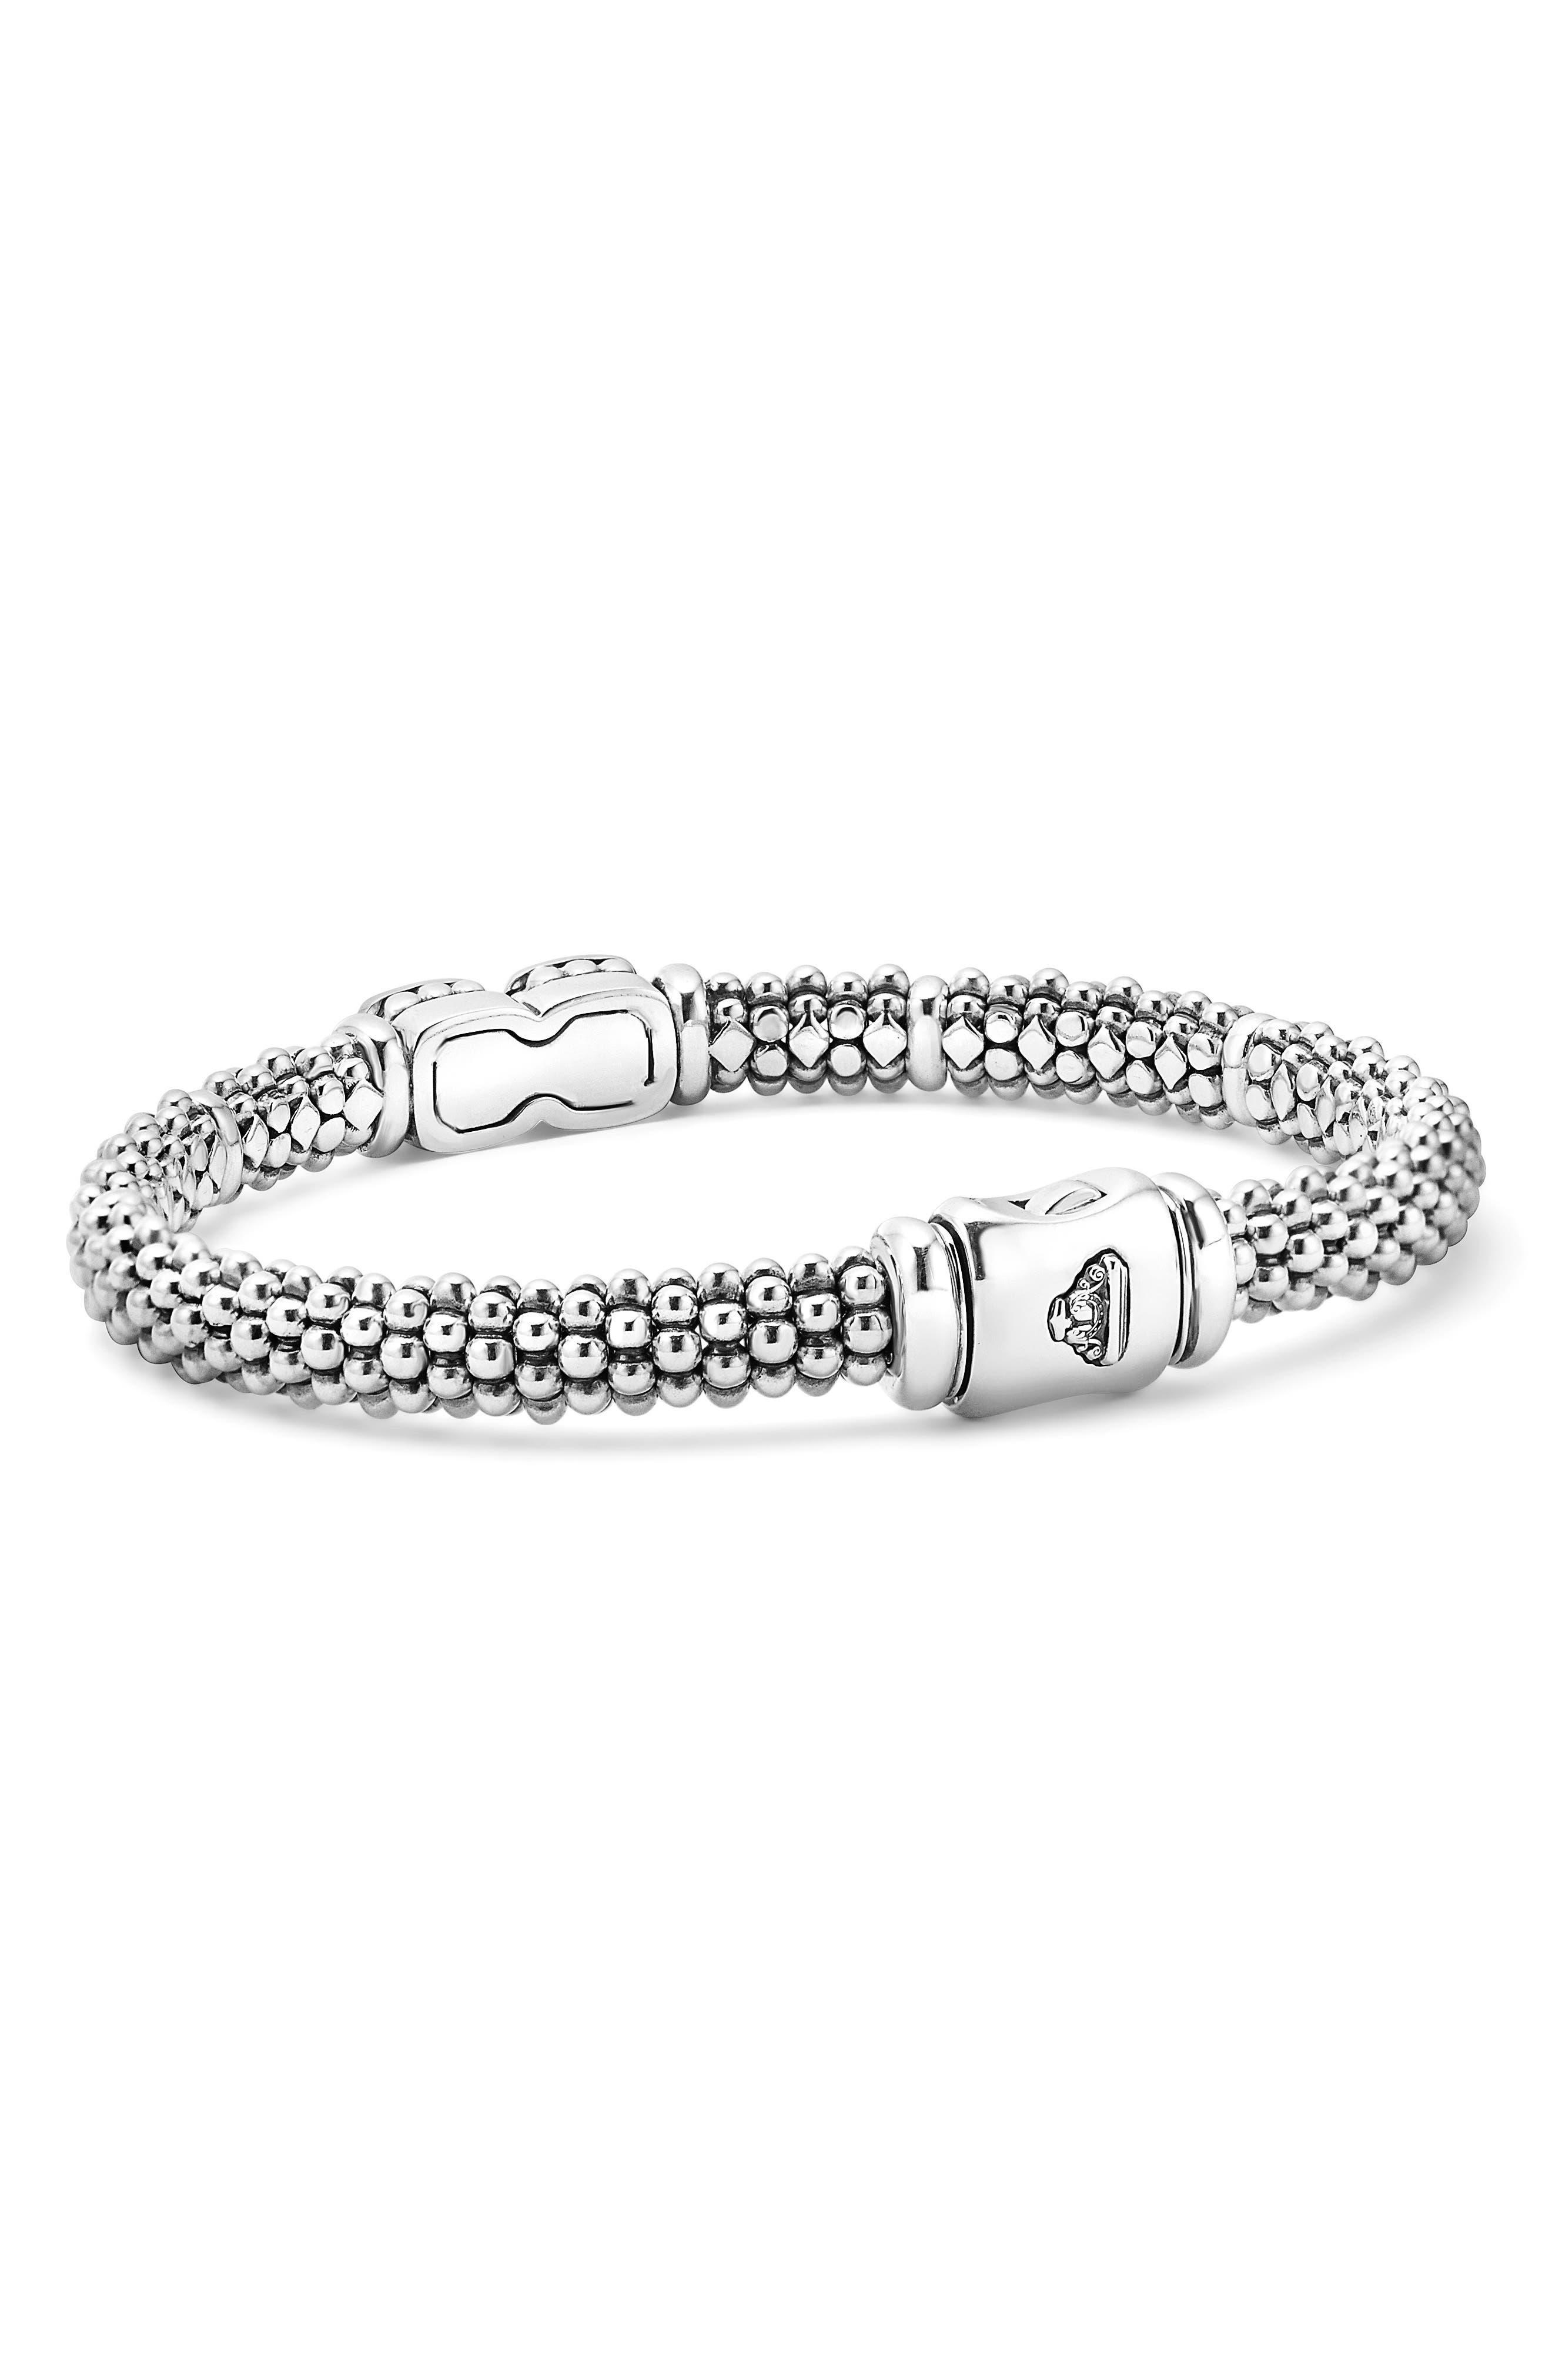 Caviar Cushion Diamond Station Bracelet,                             Alternate thumbnail 3, color,                             Silver/ Gold